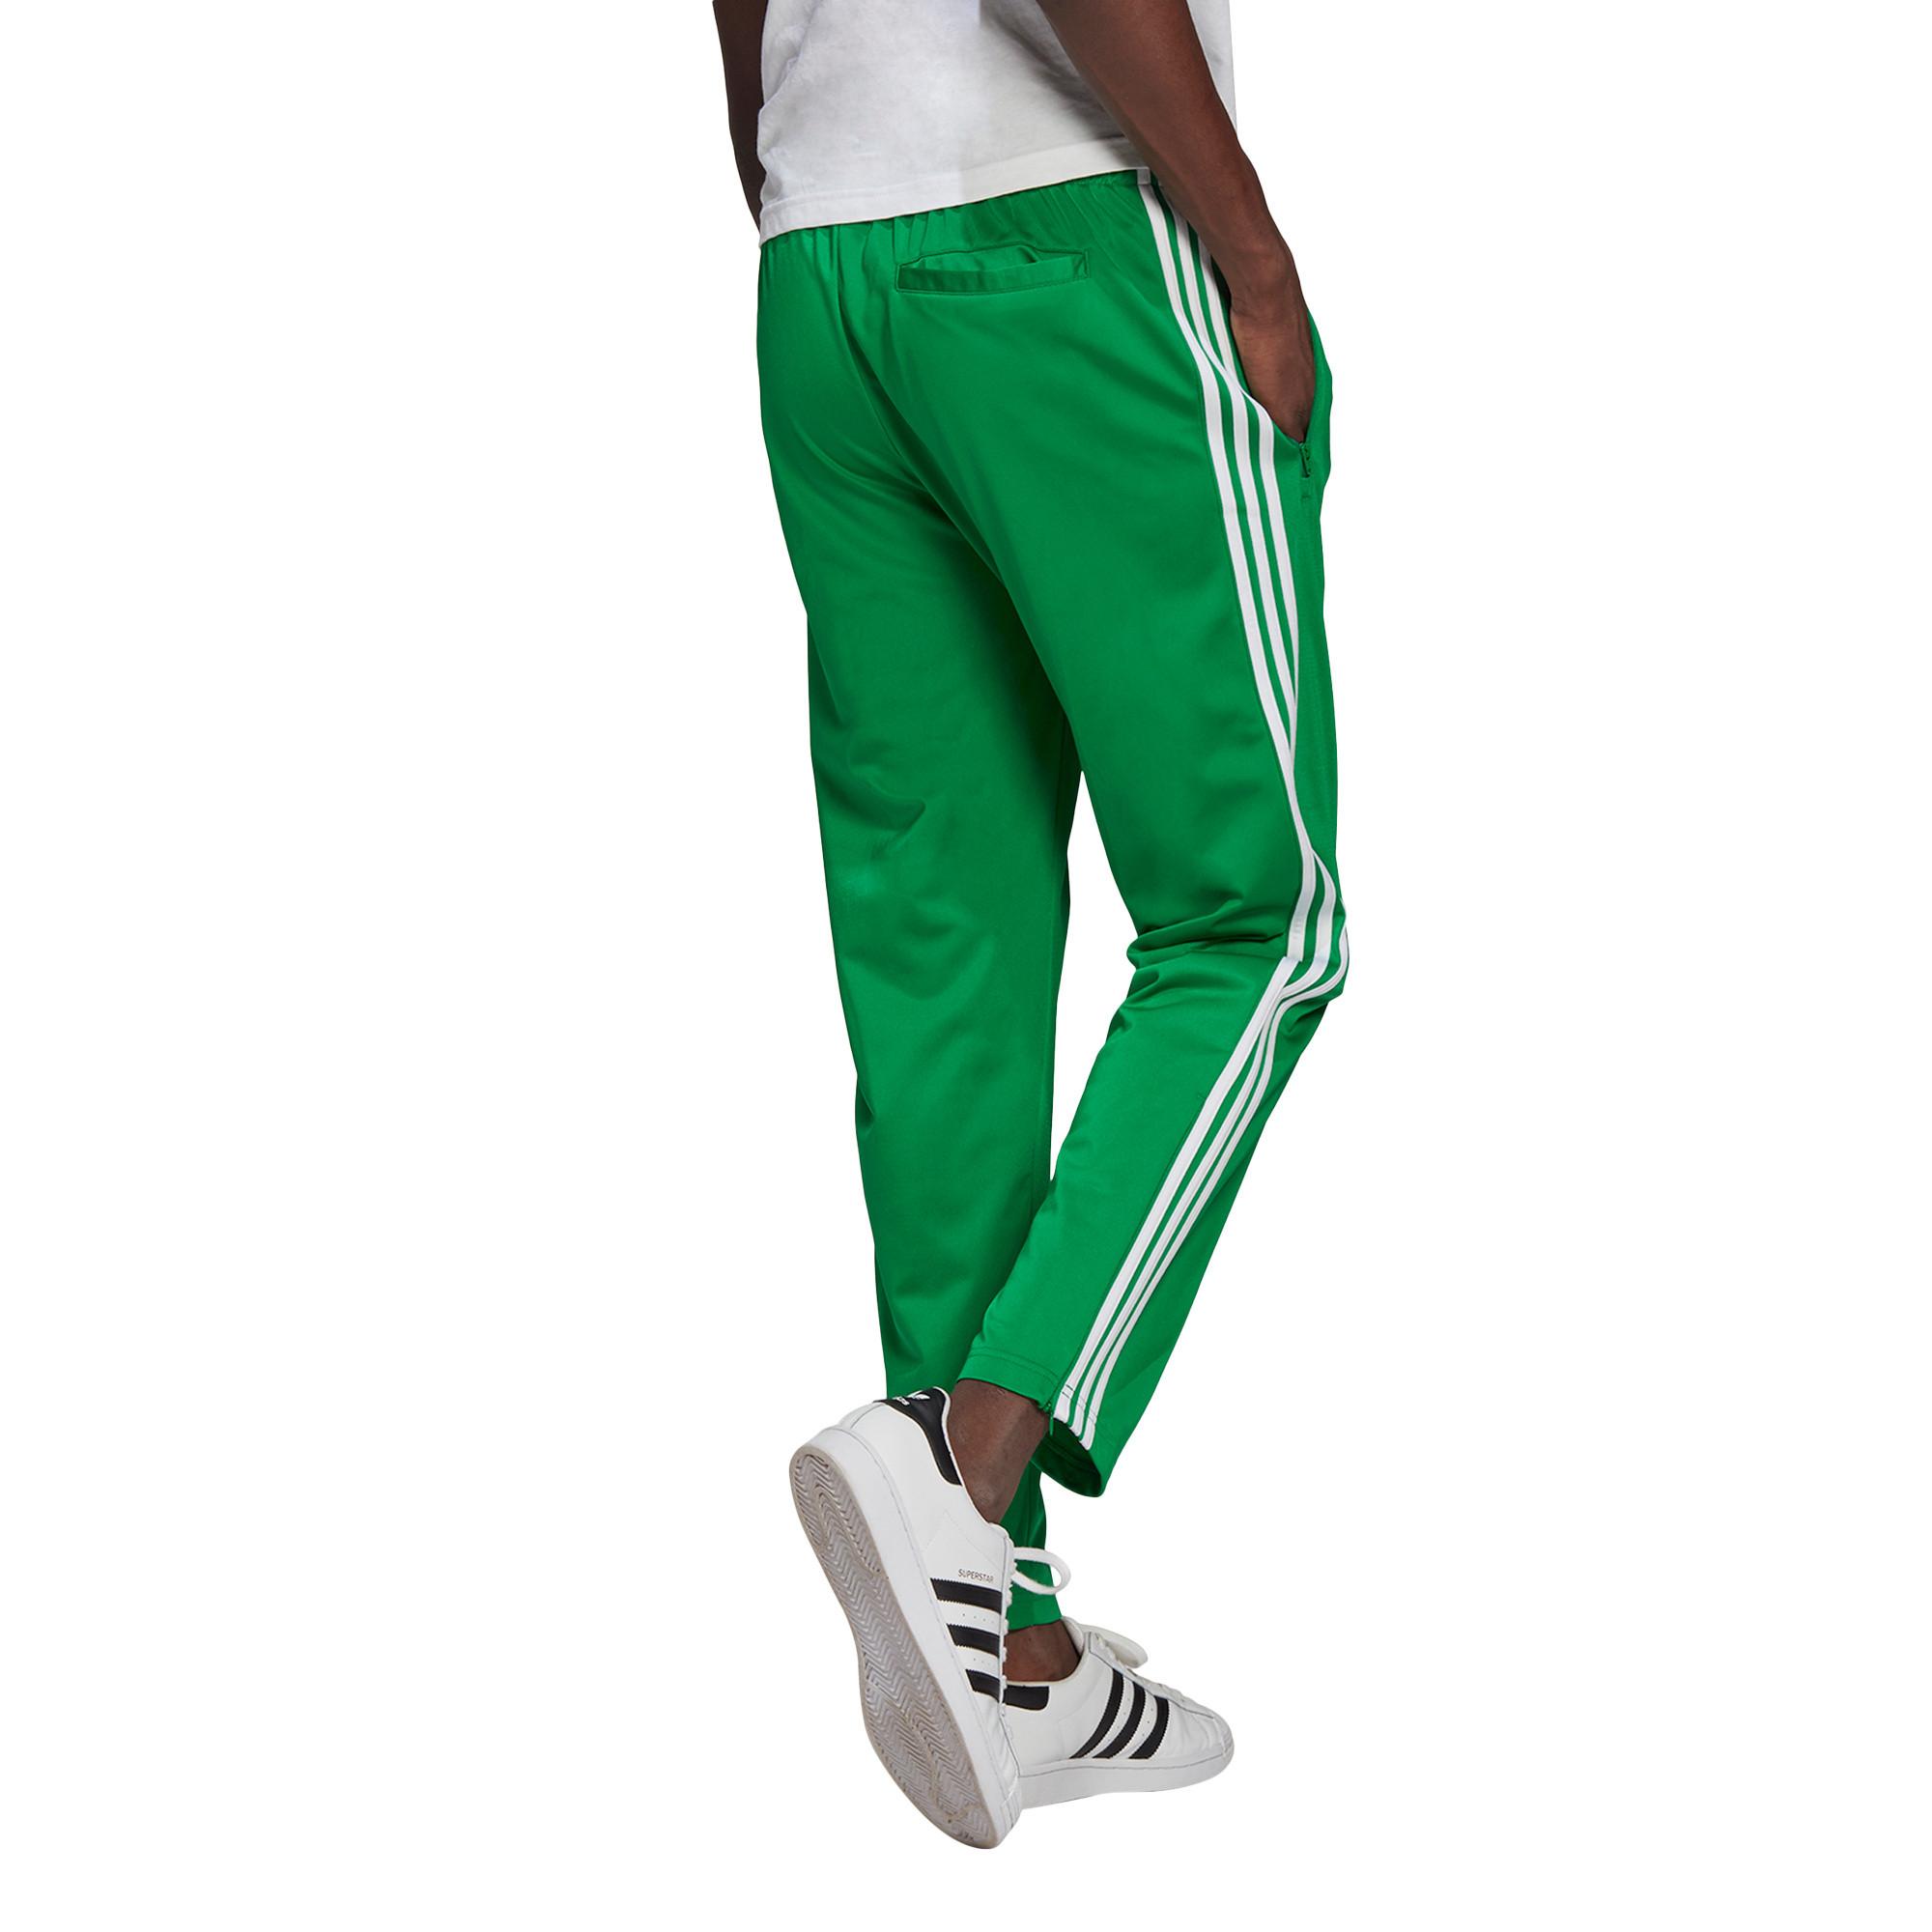 Pantaloni tuta adicolor classics, Verde, large image number 4